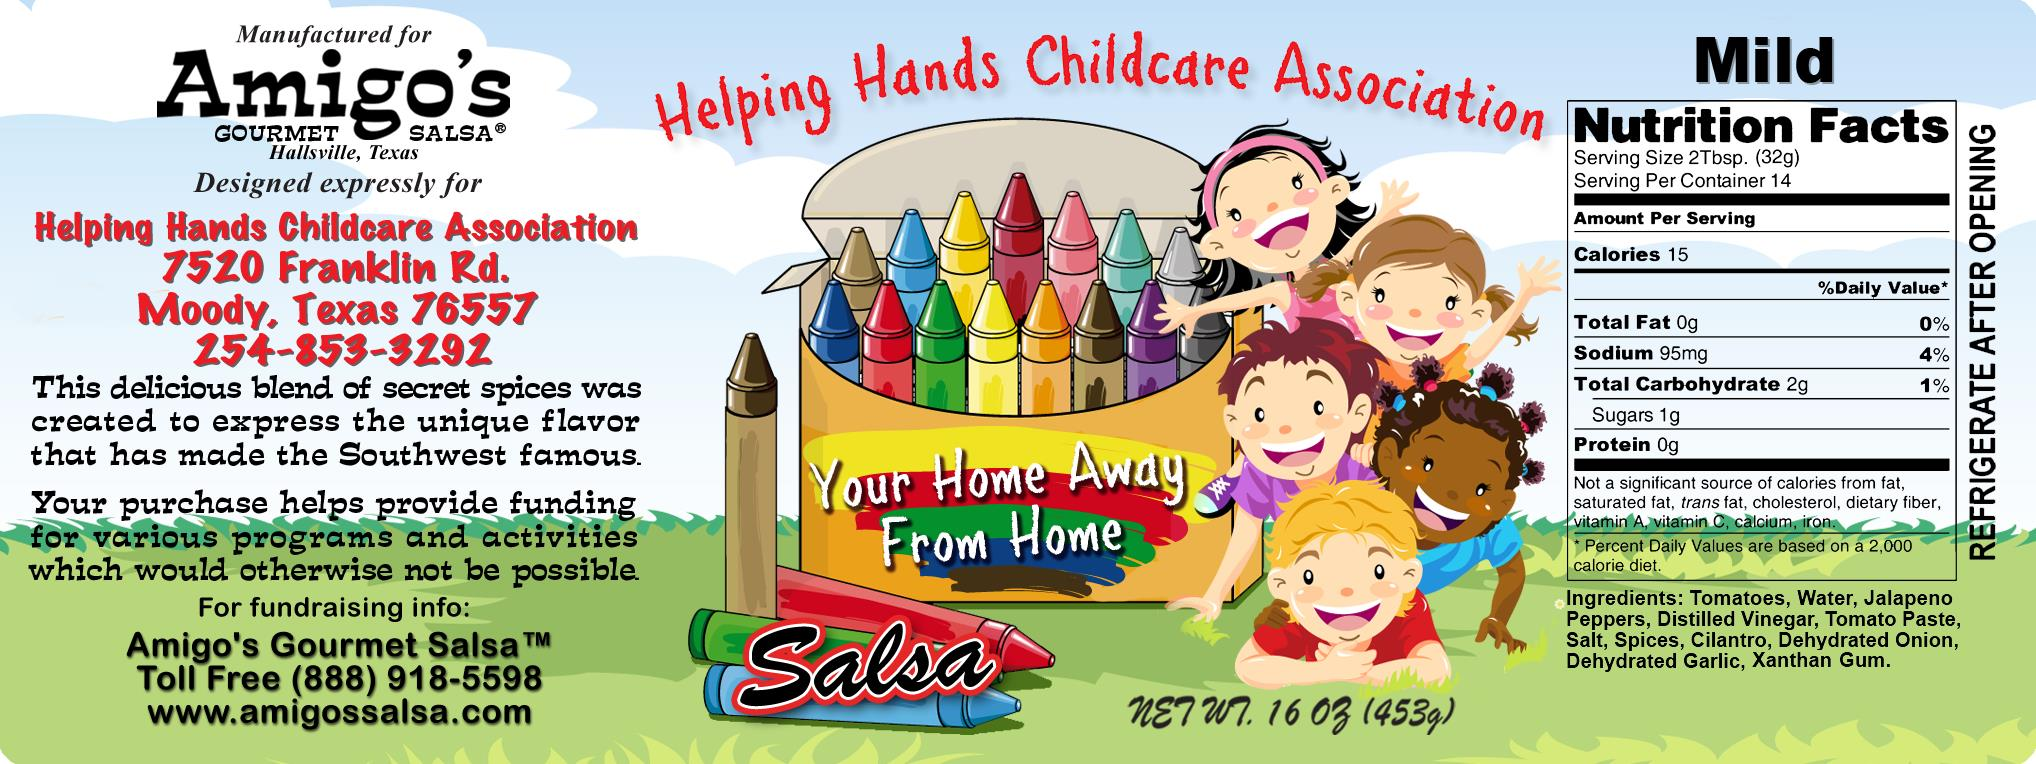 Helping Hands Childcare Jar Label MILD.jpg